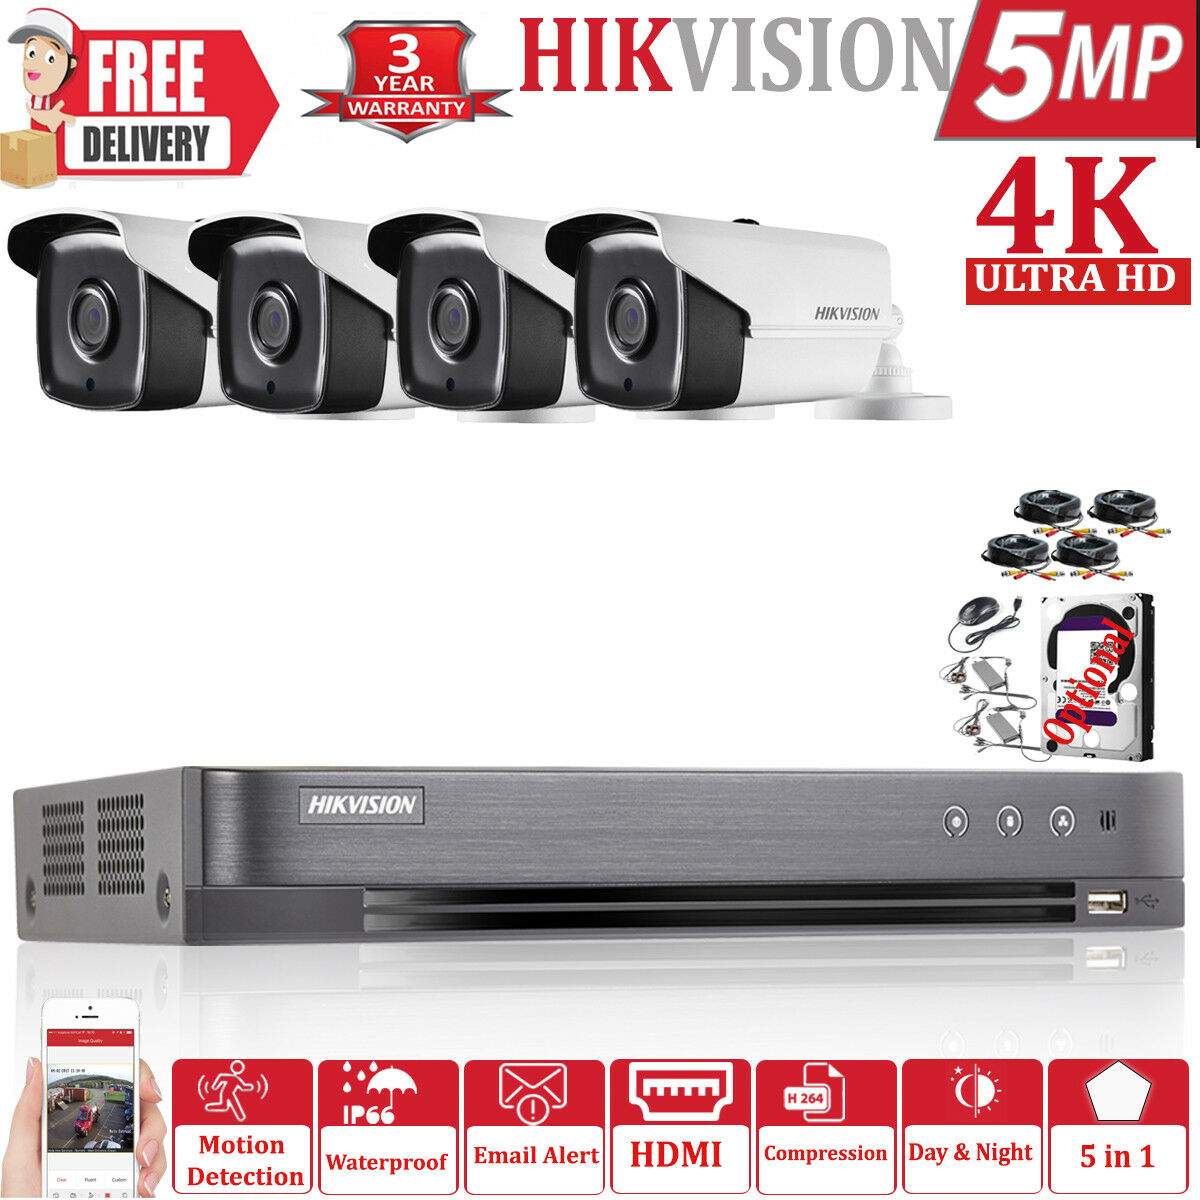 Hikvision 5MP CCTV Sistema Ultra HD DVR bala 4CH 8CH 3.6MM 40M Kit de cámara de bala DVR Exir cbb299